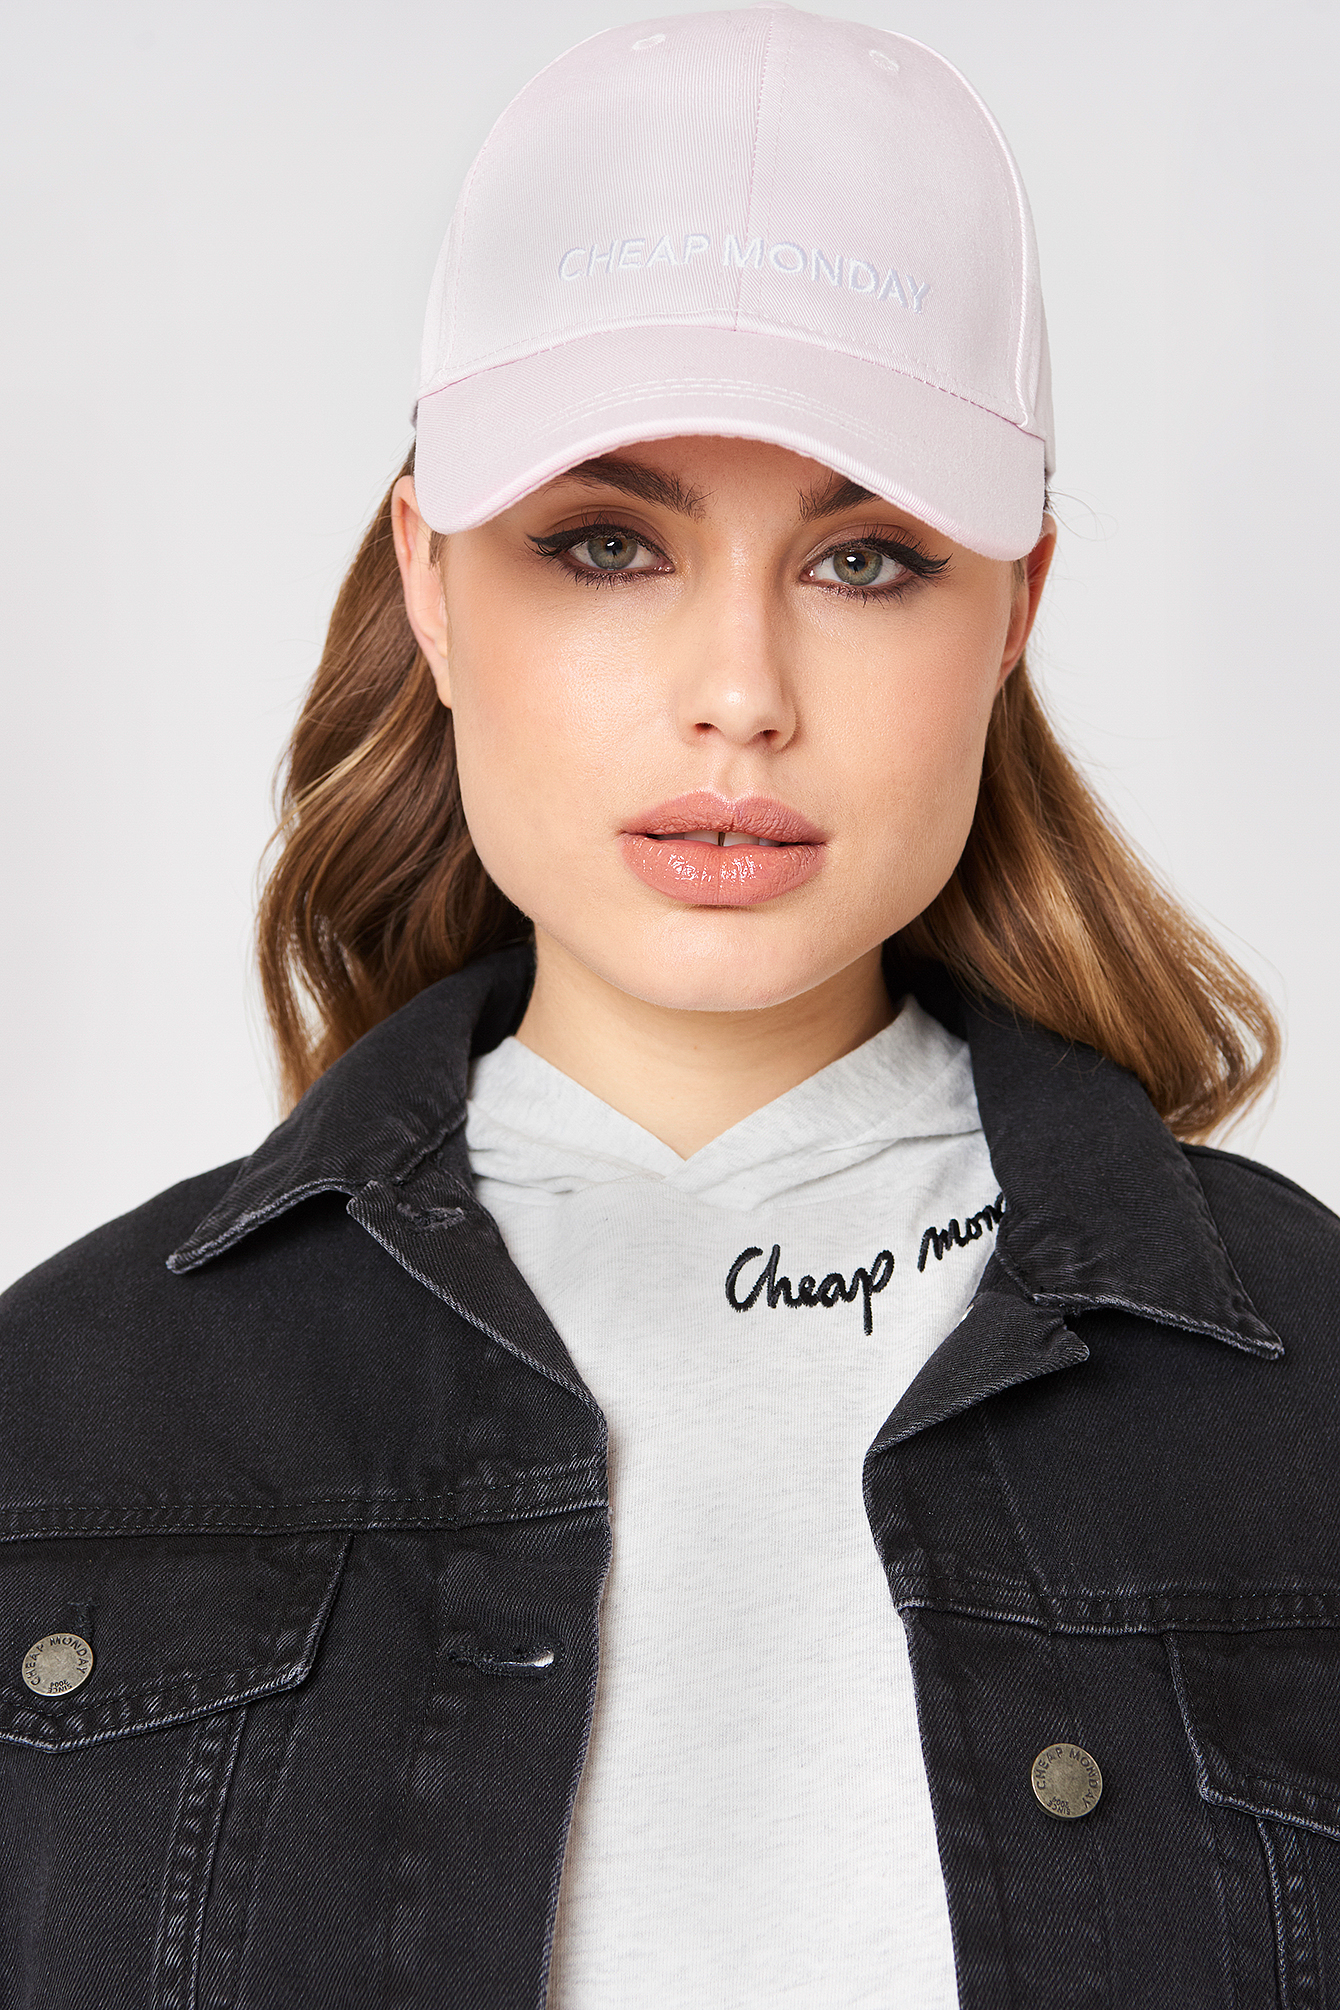 cheap monday -  CM Baseball Cap - Pink